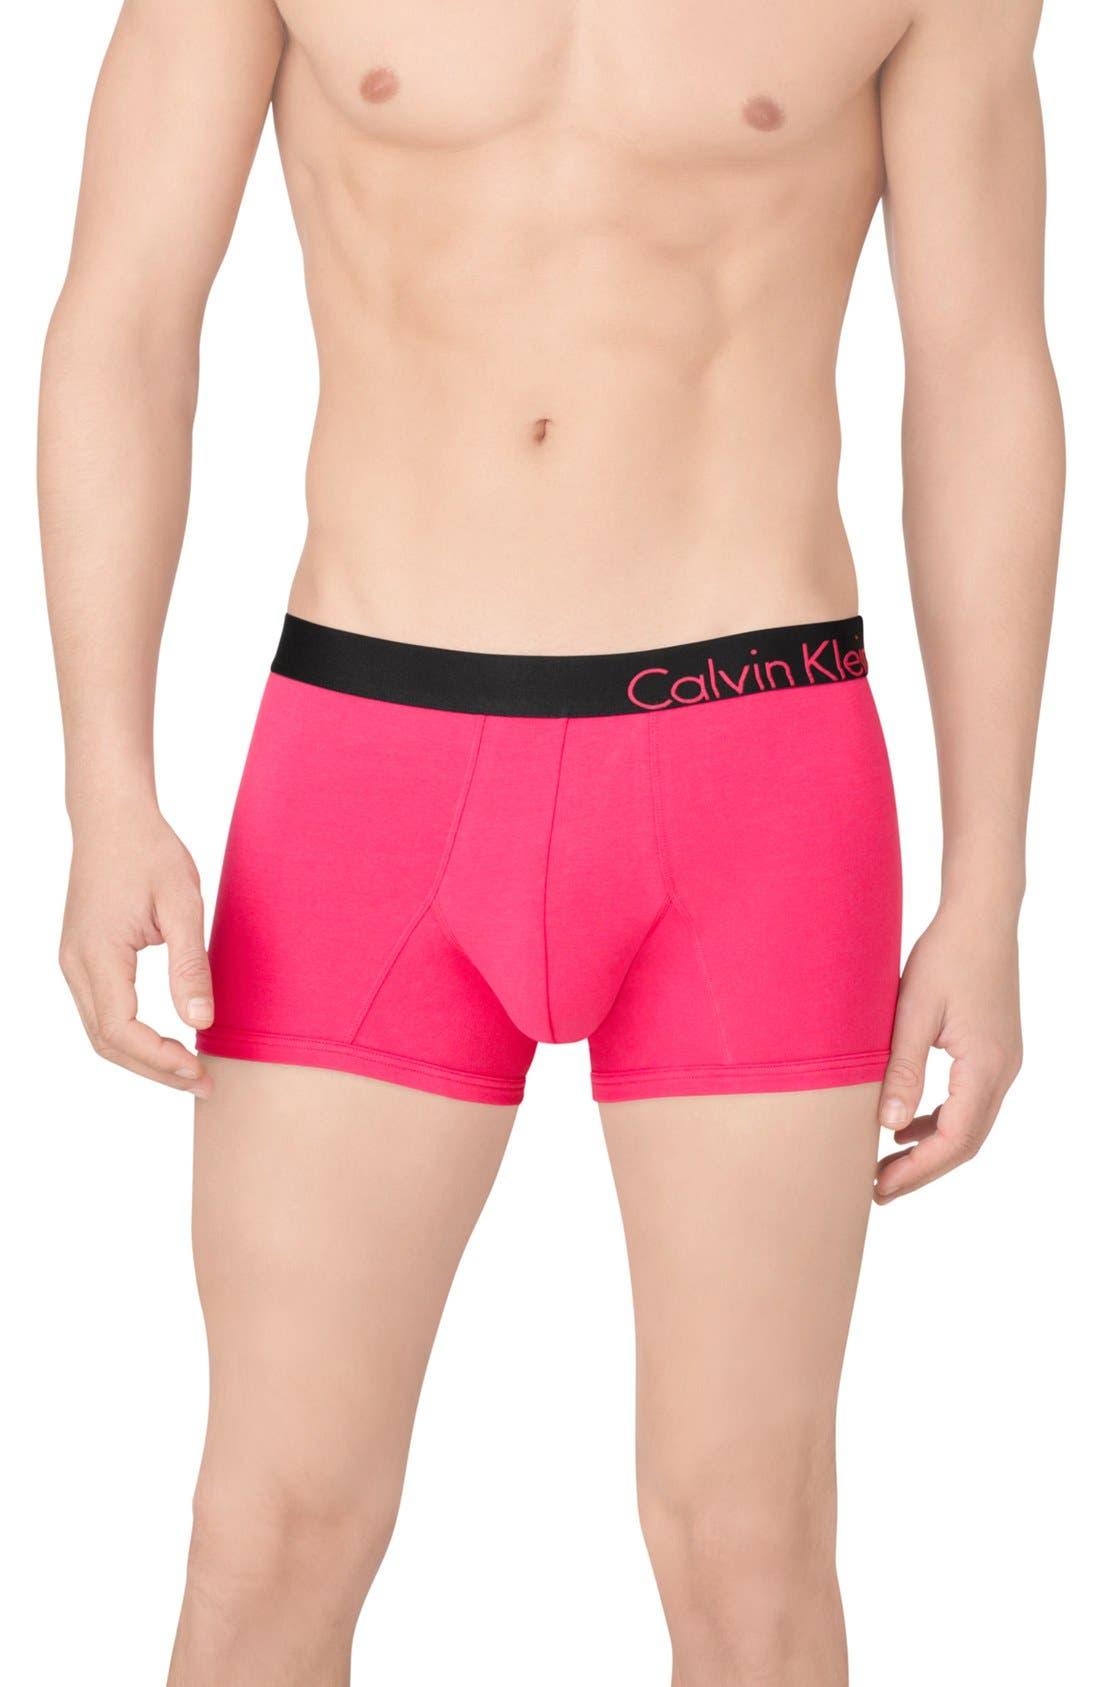 Main Image - Calvin Klein 'Bold Cotton - U8902' Trunks (Online Only)